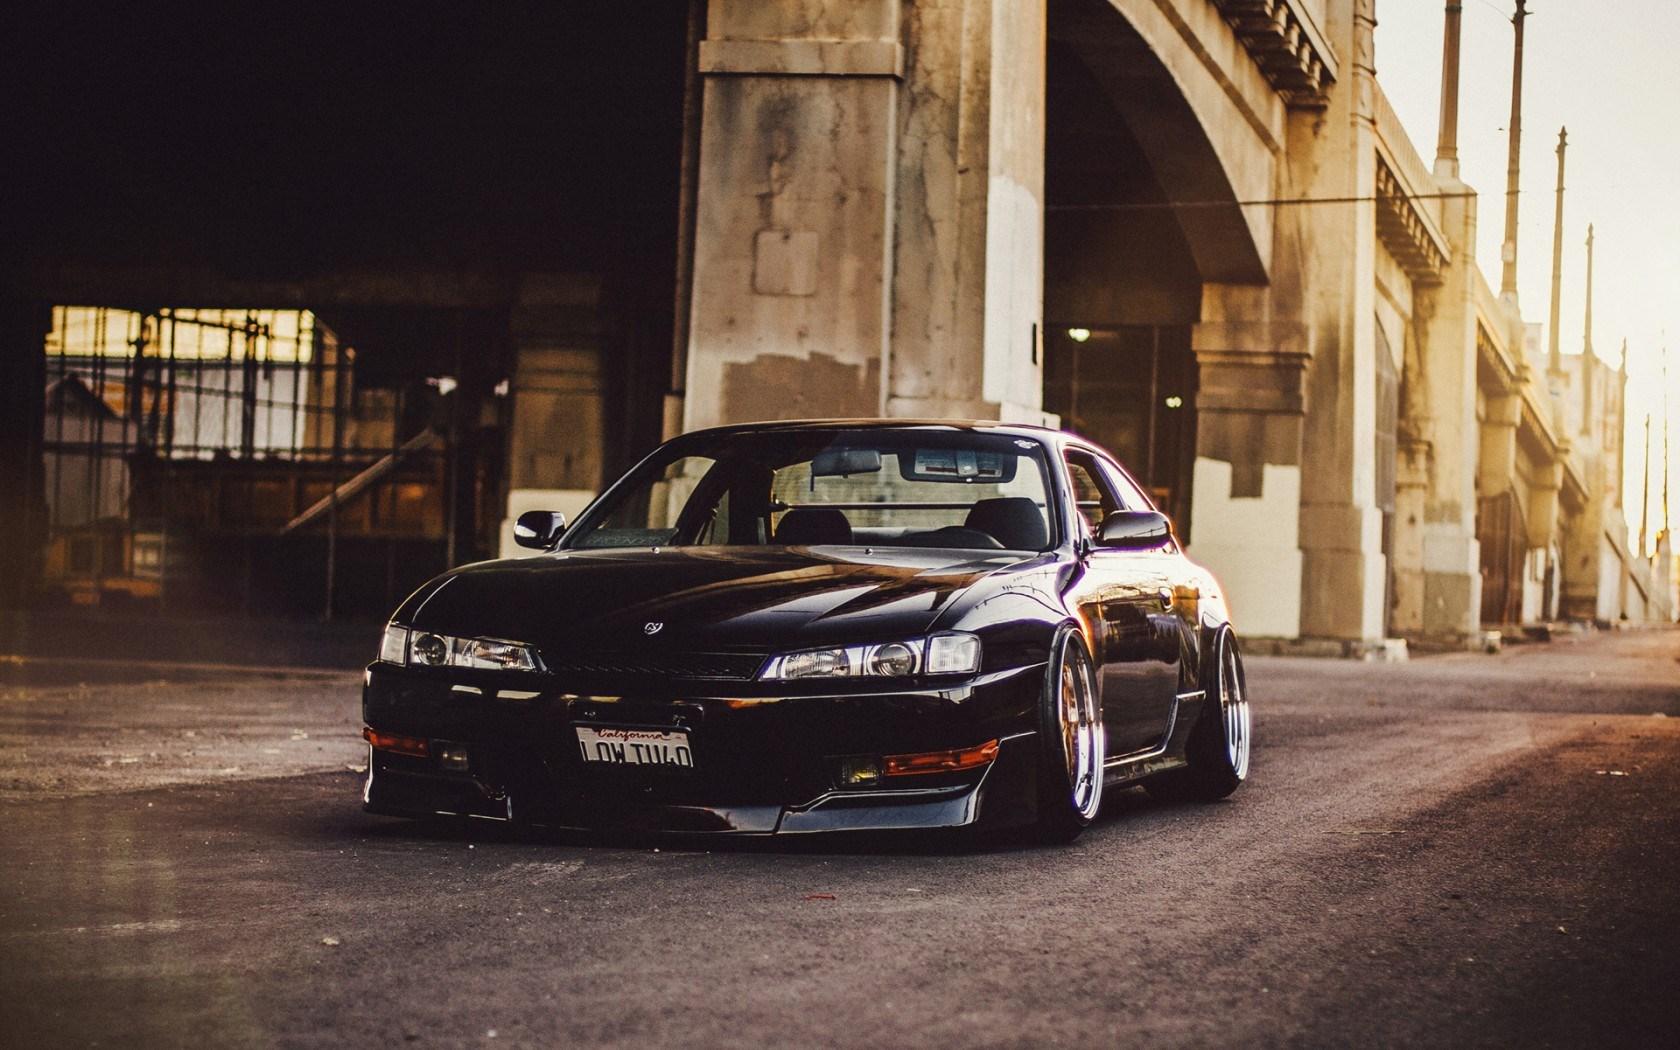 Nissan Silvia 240SX S14 Car Tuning Front